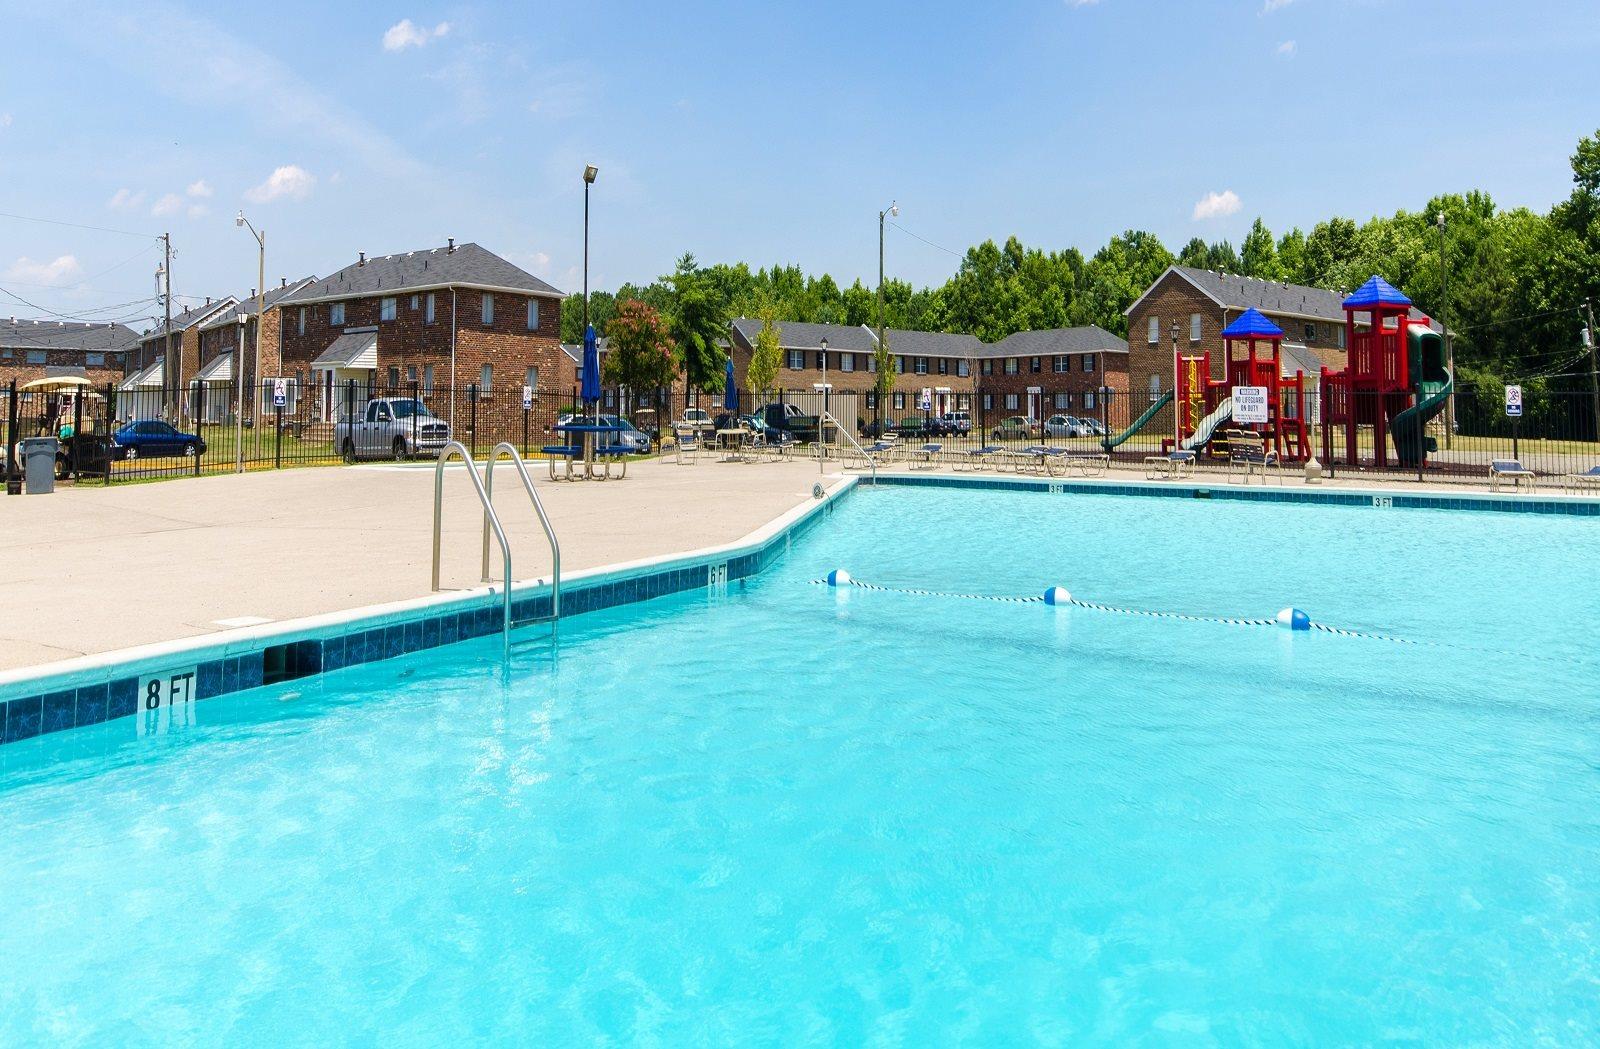 11 North Oak Pool and Playground